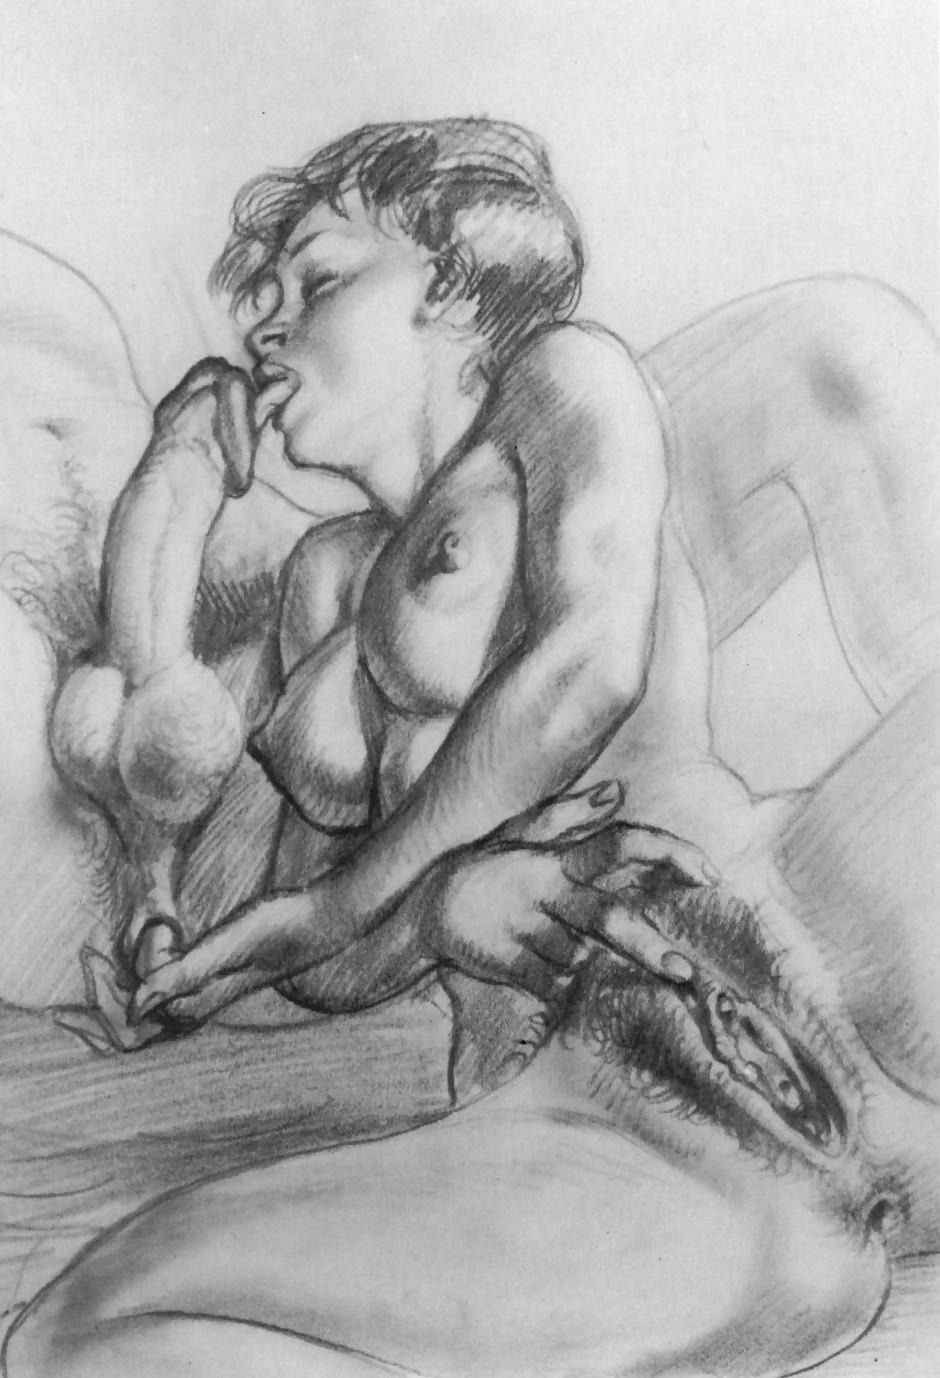 Awesome drawn fantasy porn pics